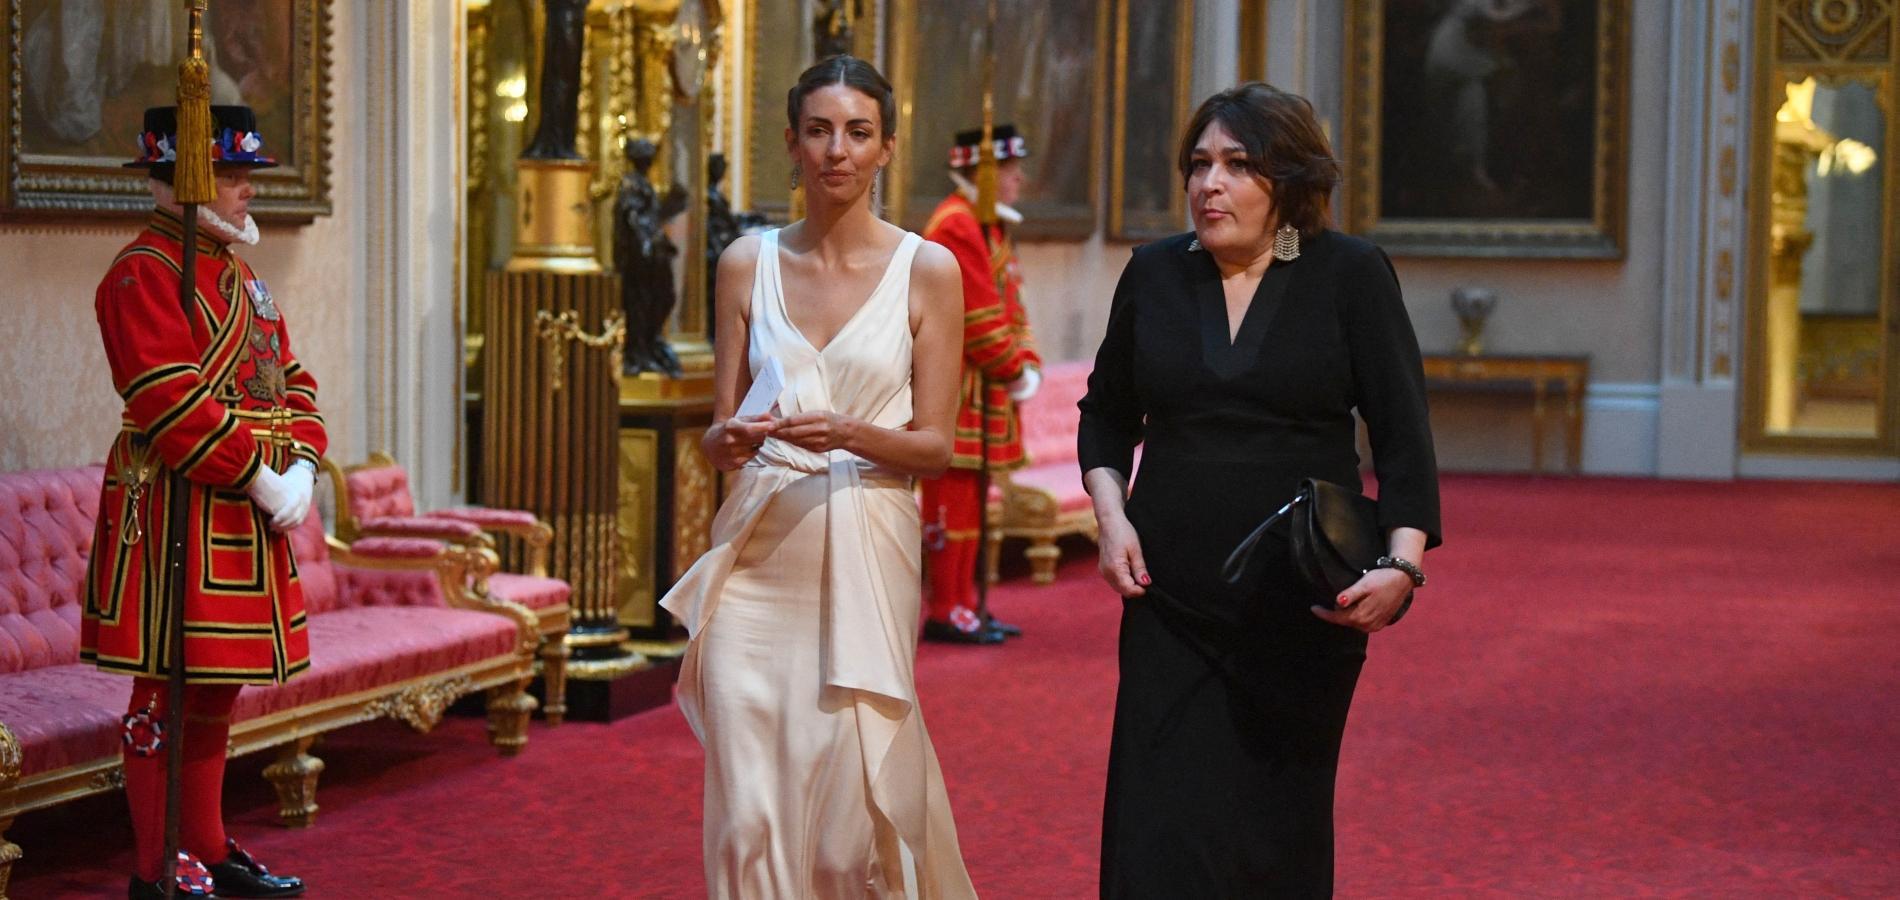 La supposée maîtresse du prince William, Rose Hanbury, ne porte plus son alliance